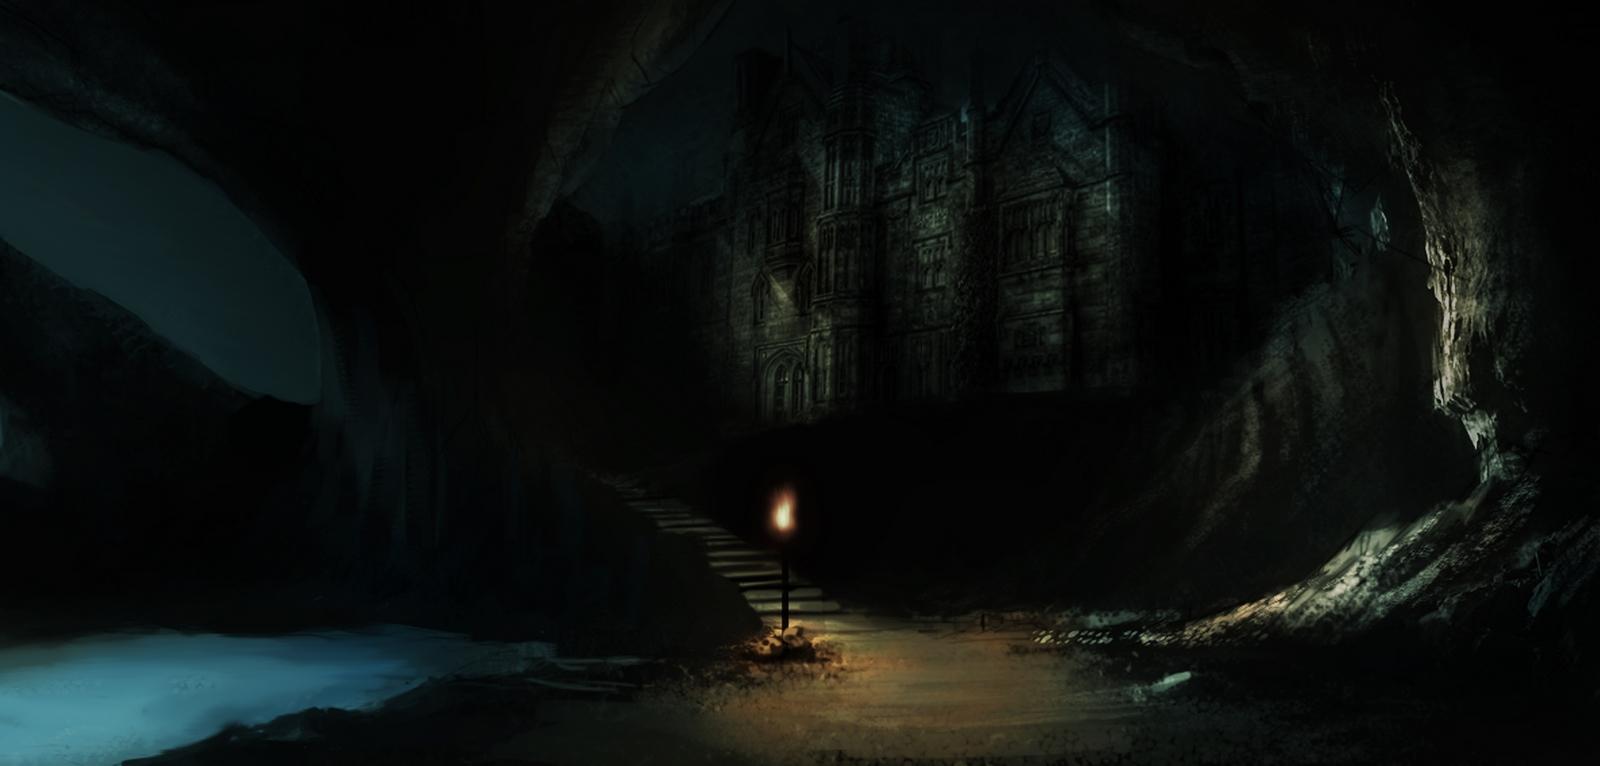 Diálogos Fascinantes de Videntes con Almas del Purgatorio